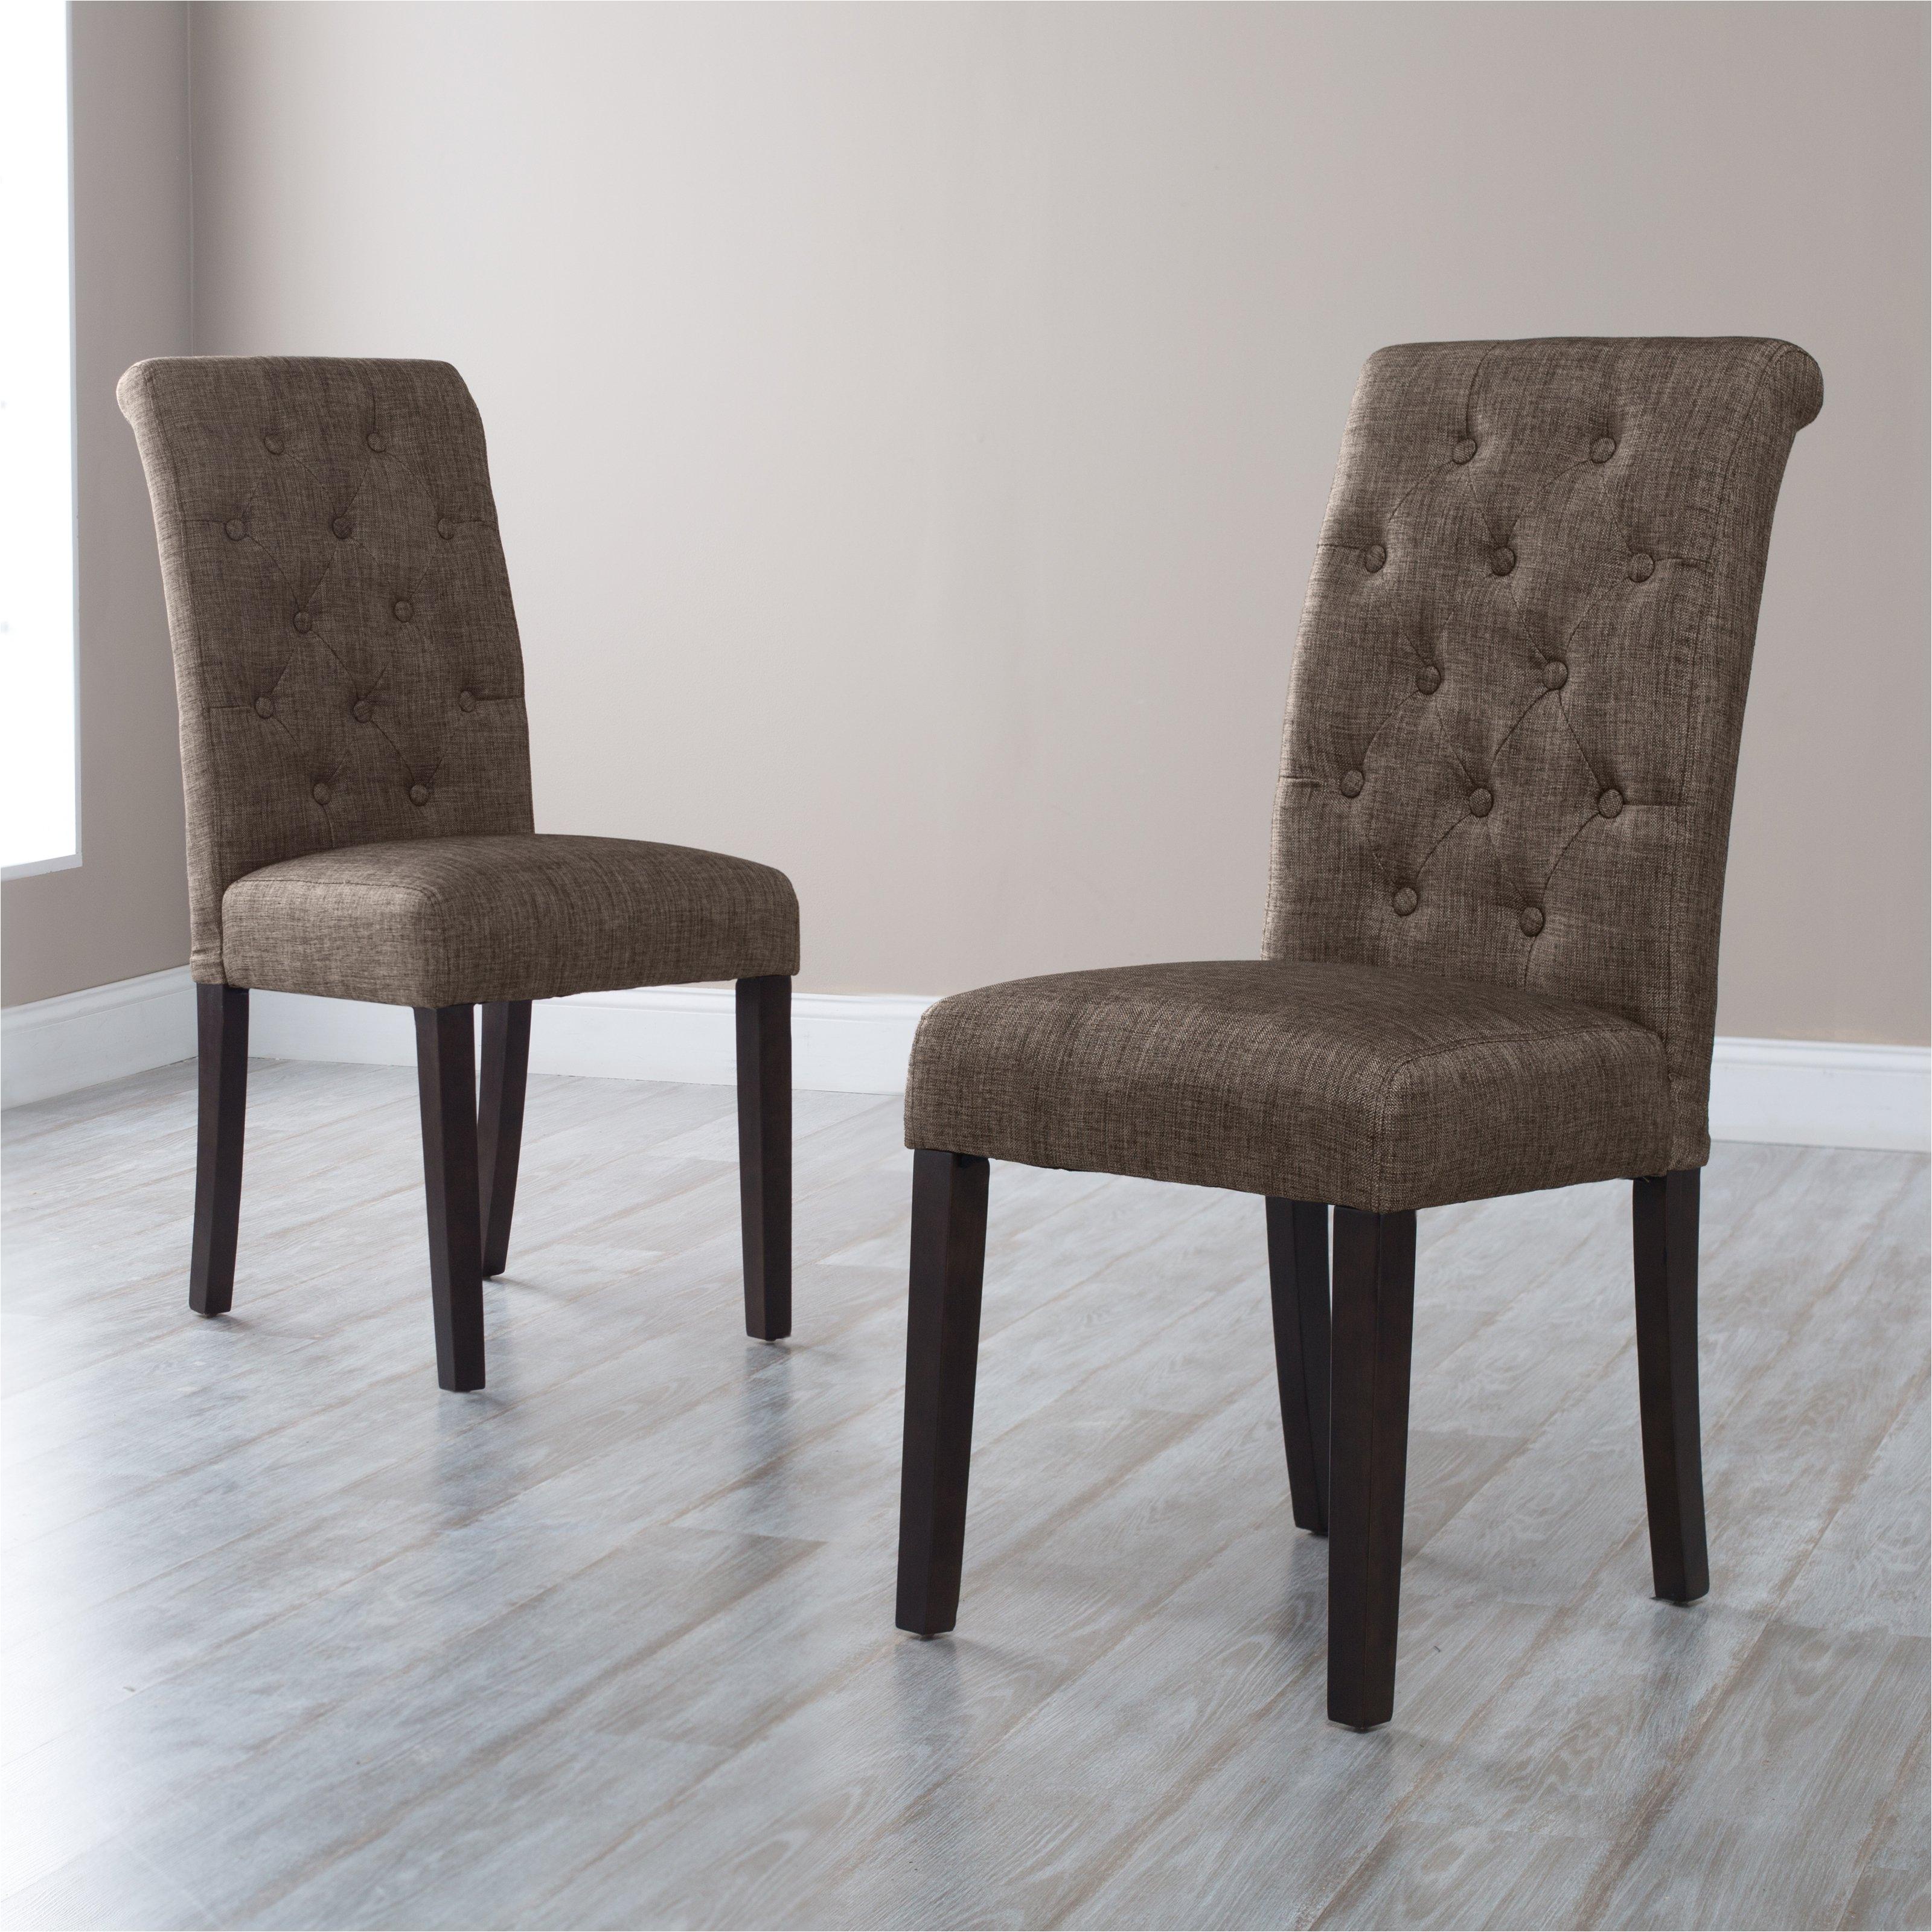 Navy Nailhead Parsons Chair Chair ashley Furniture Chairs Beautiful Antique English Pinedsofa